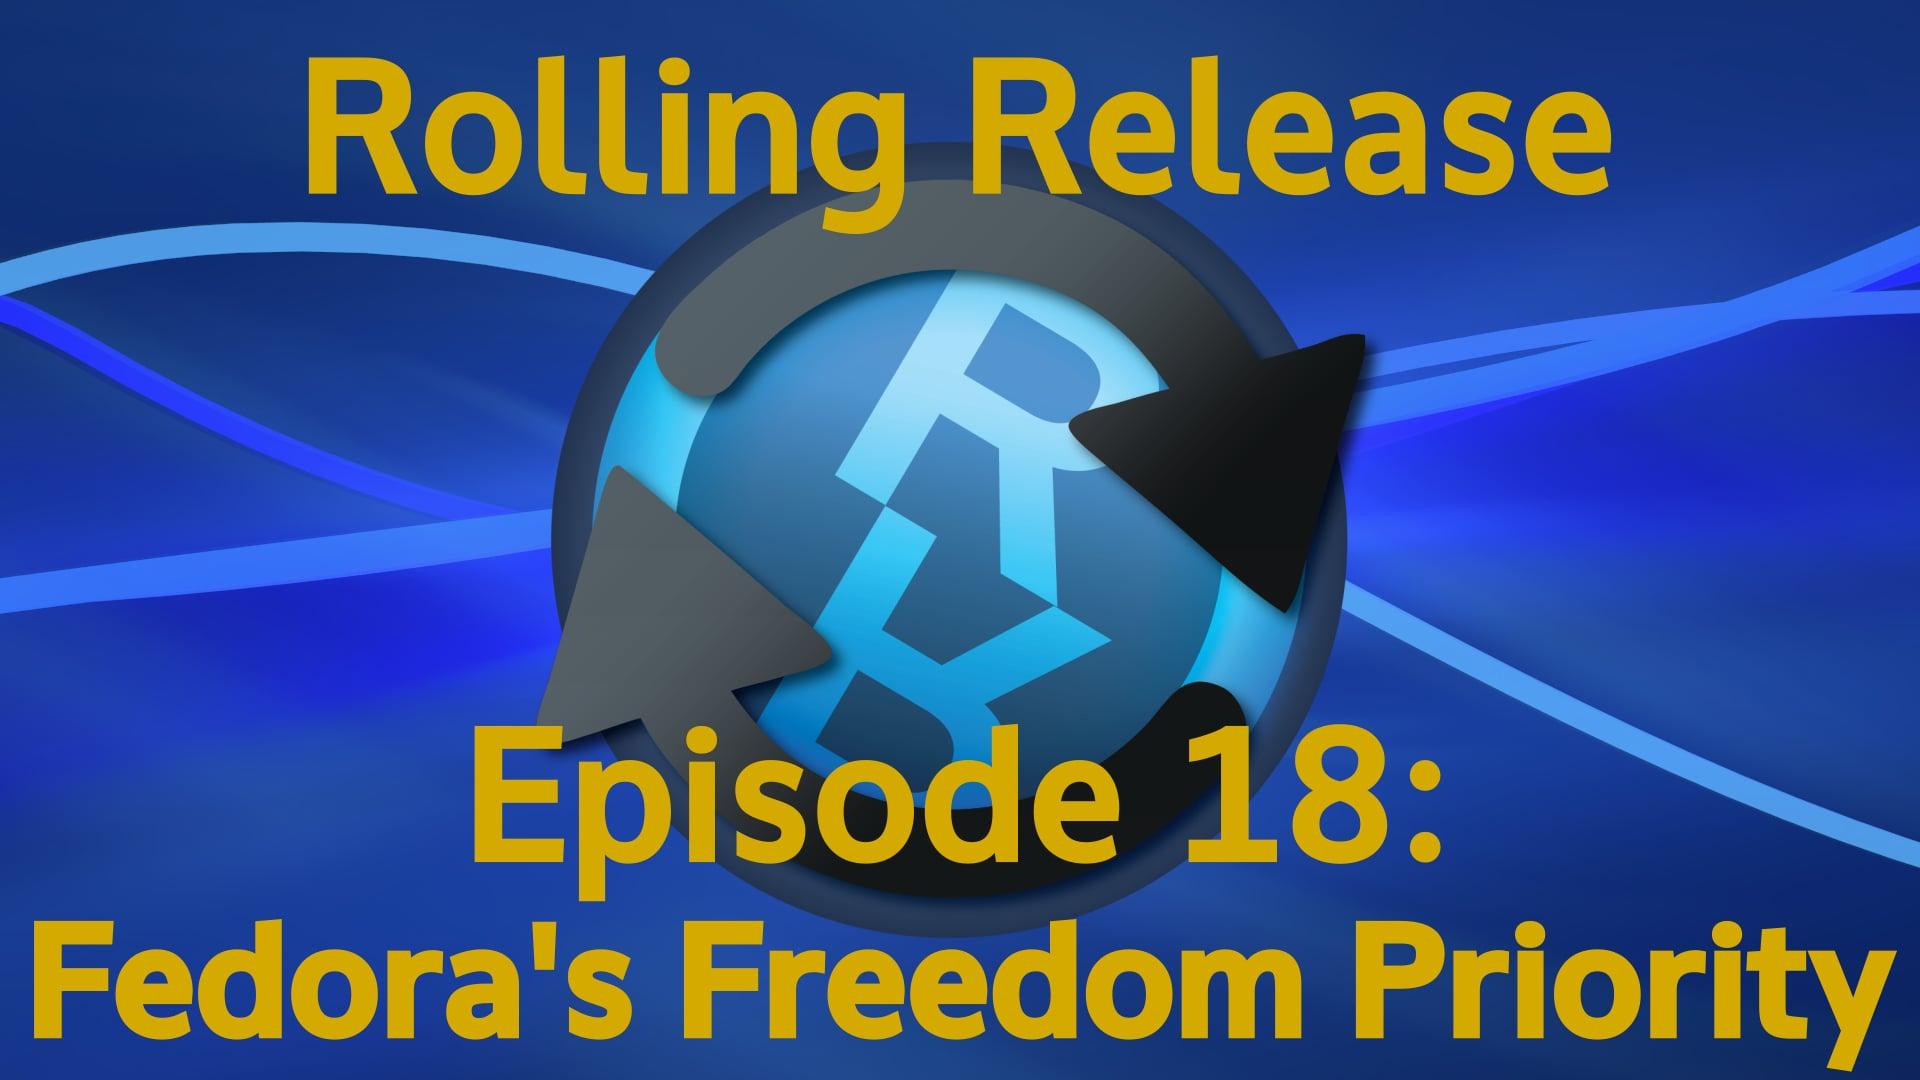 Fedora's Freedom Priority - Rolling Release #18